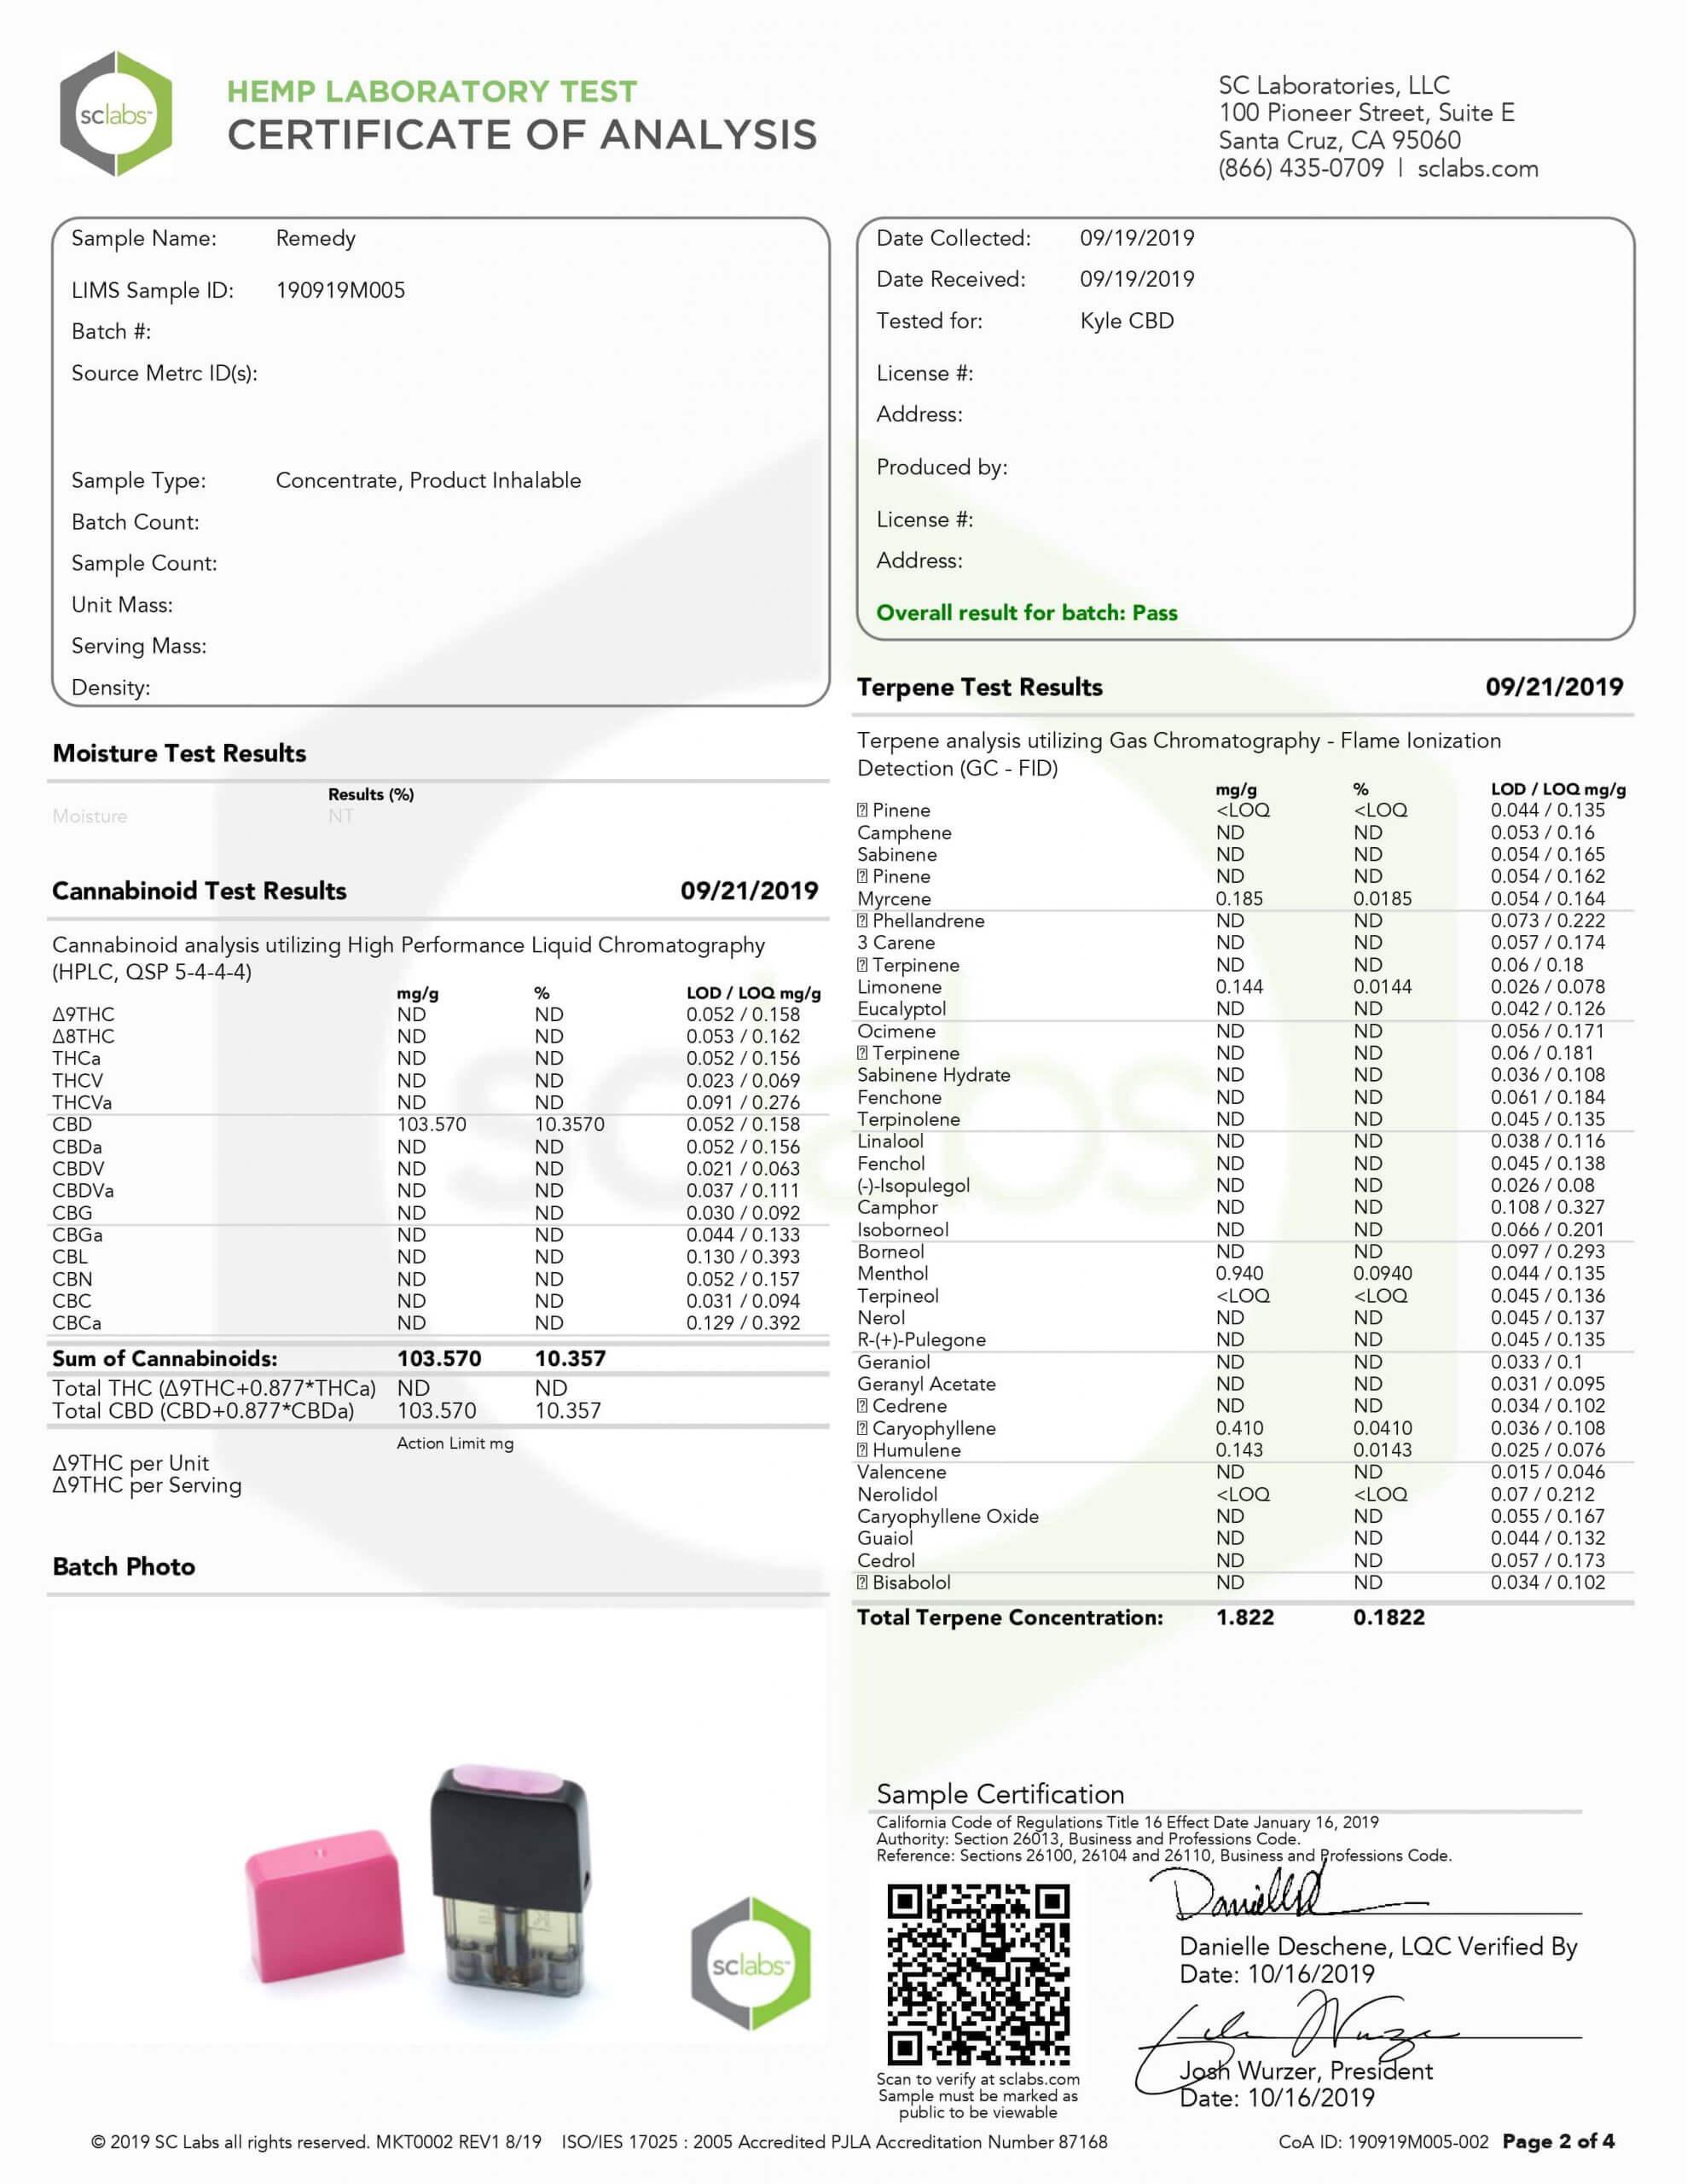 KYLE CBD Pods Remedy Lab Report